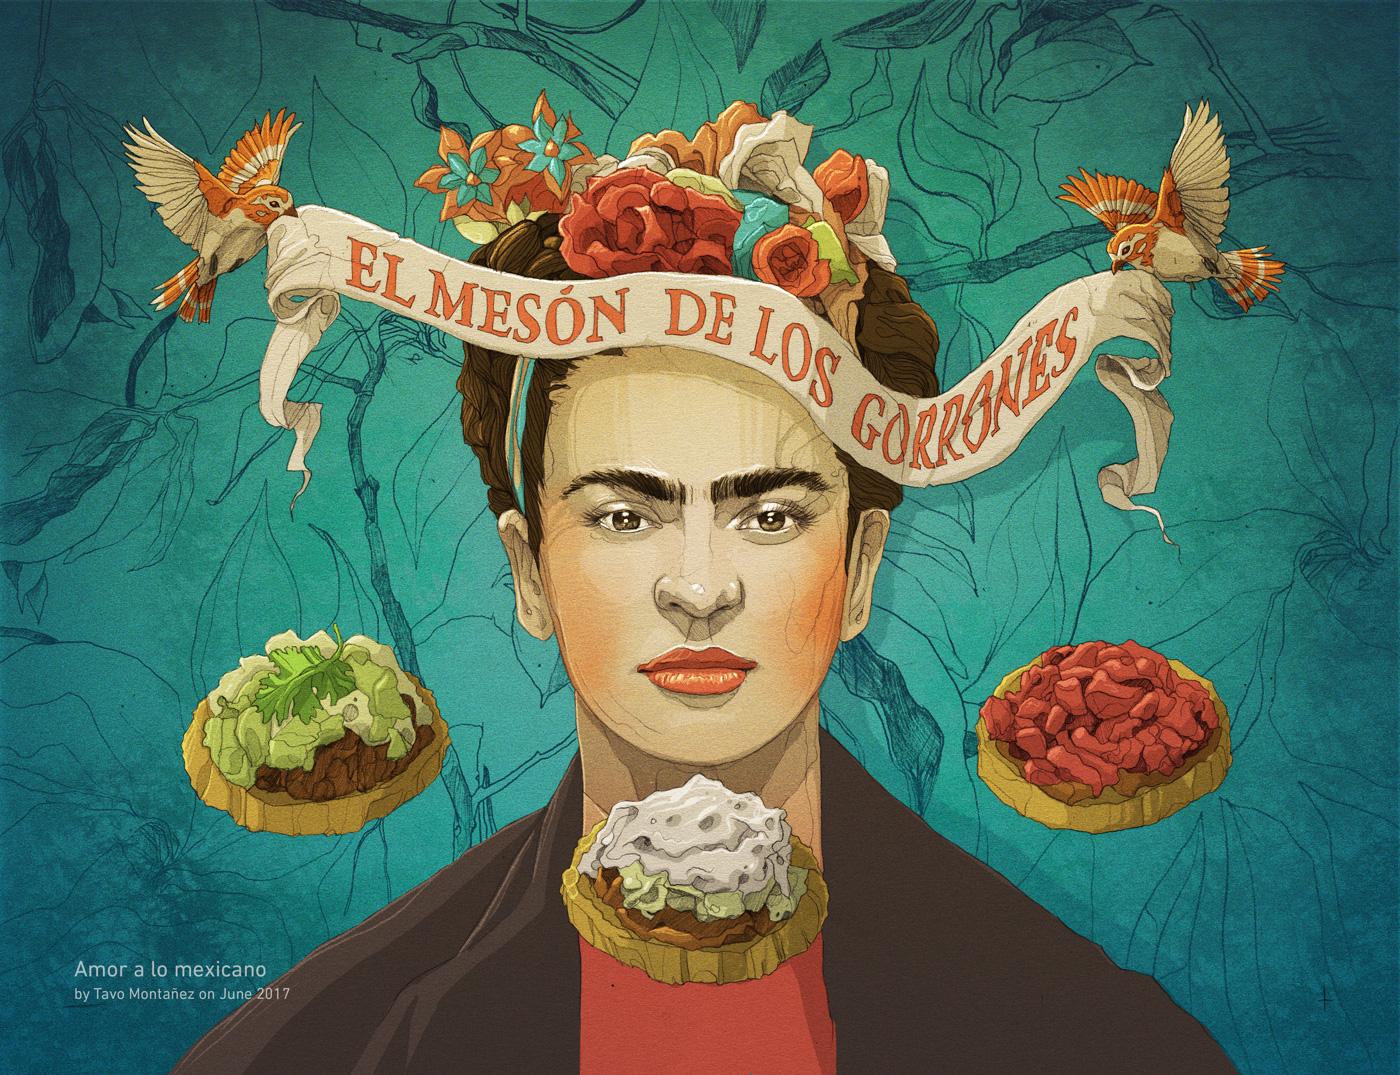 Frida Kahlo editorial magazine digital illustration Adobe Photoshop Wacom Cintiq Drawing  ILLUSTRATION  art mexico